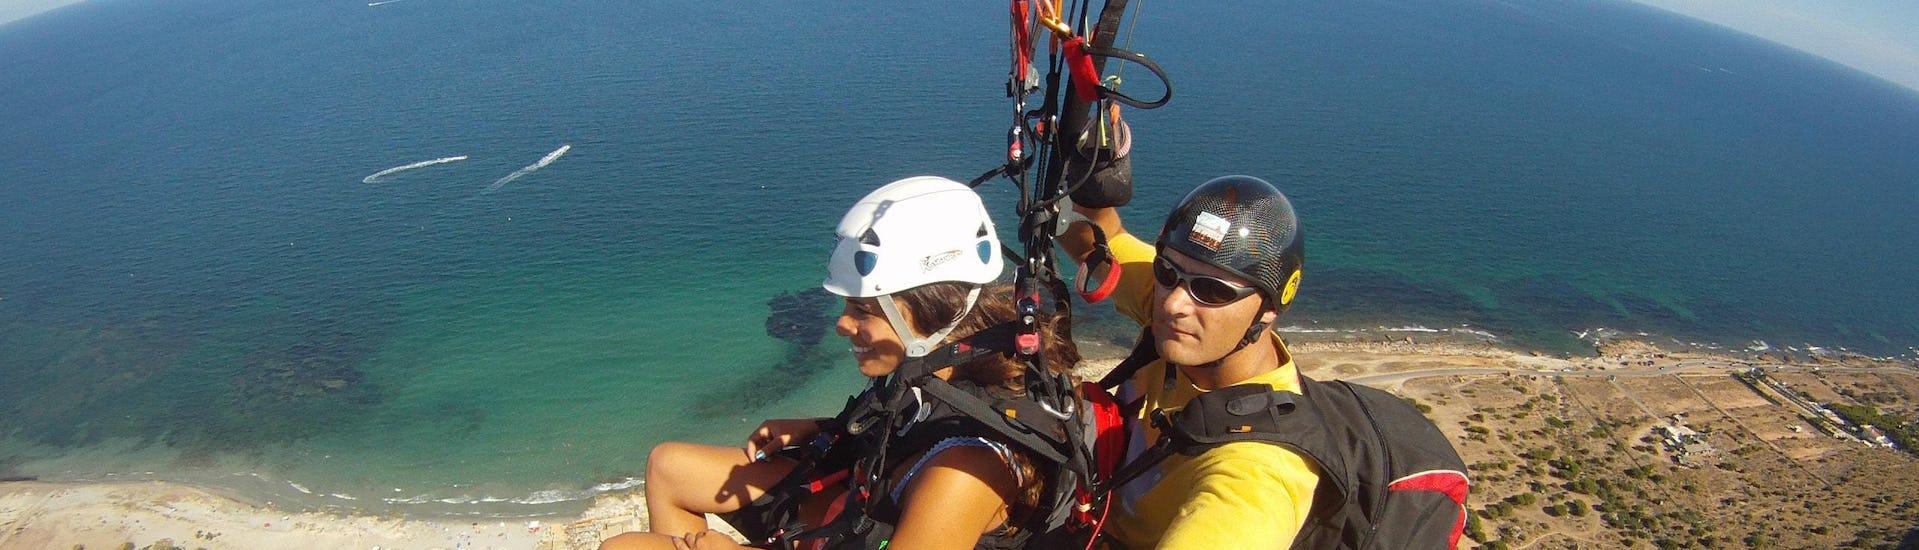 tandem-paragliding-panorama-flight---costa-blanca-parapente-santa-pola-hero